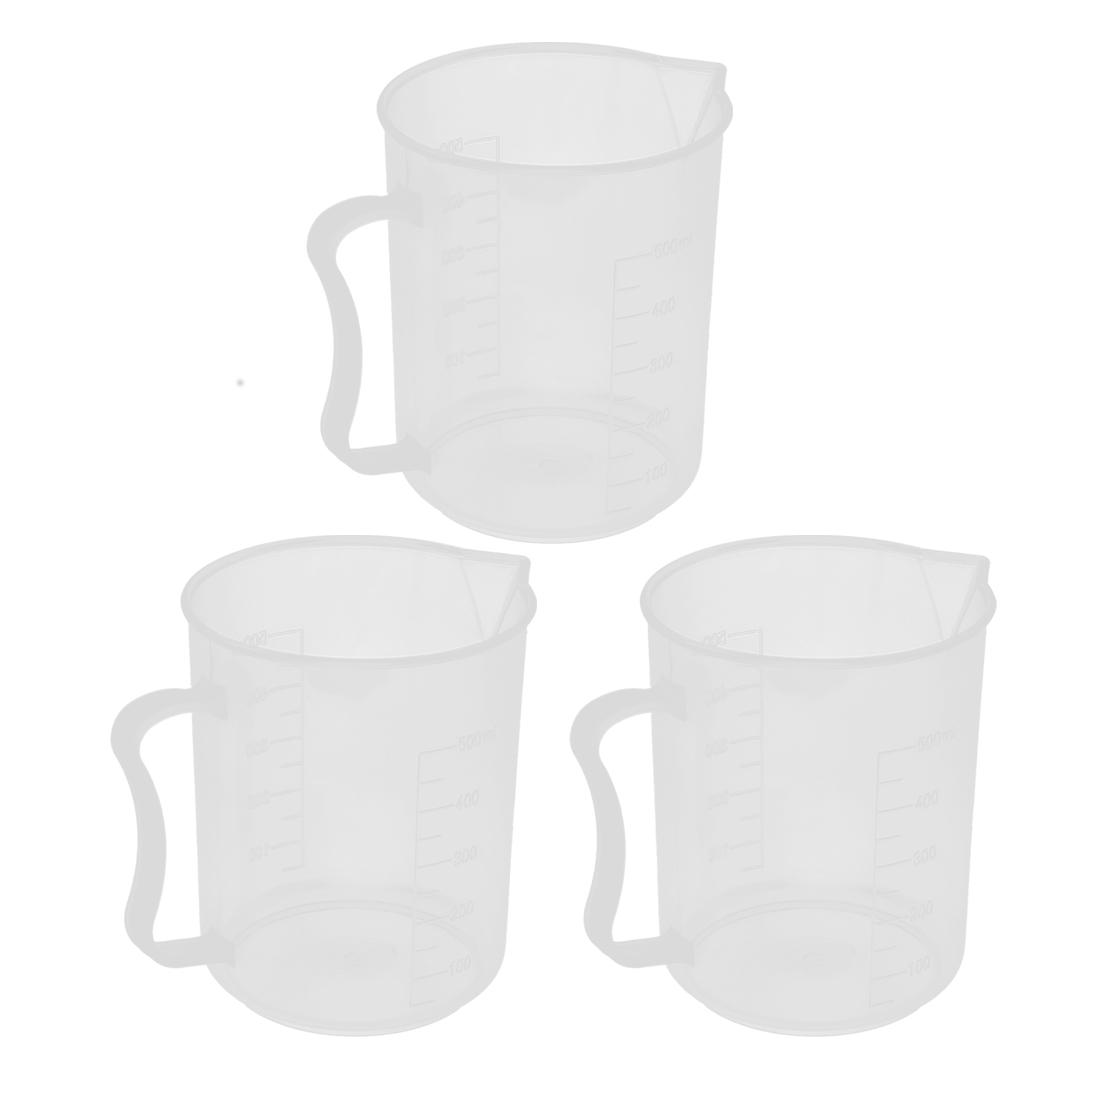 3pcs 500mL Capacity Clear White Plastic Graduated Water Liquid Beaker Measuring Testing Cup Measurer